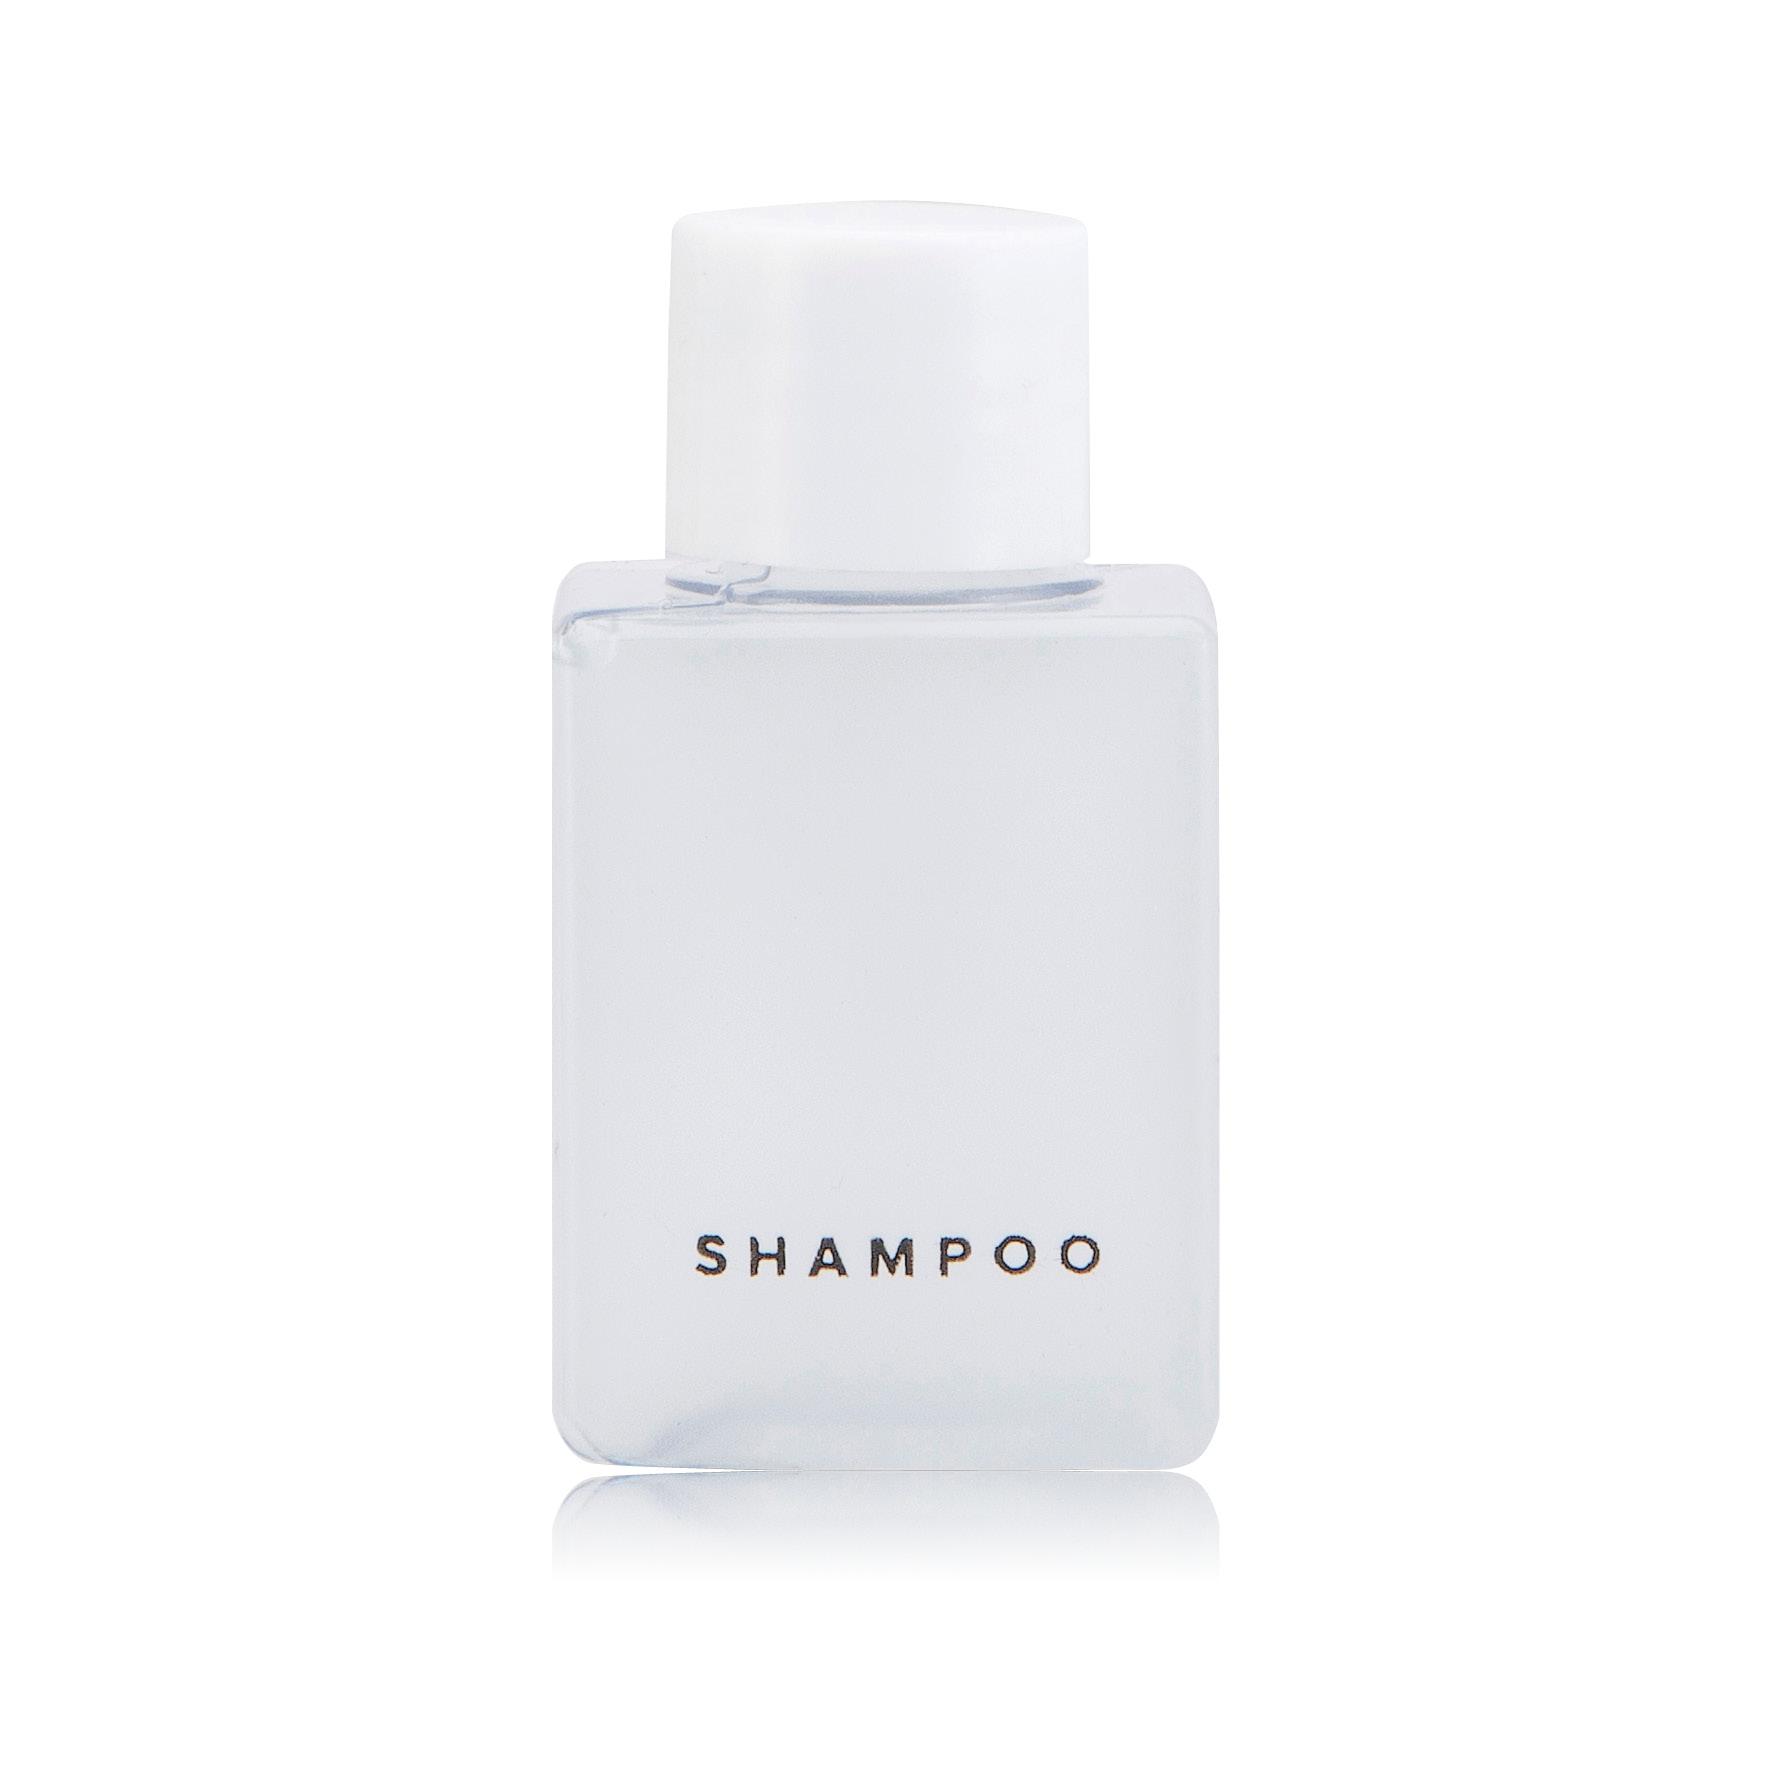 CONTEMP 35ML SHAMPOO FRONT